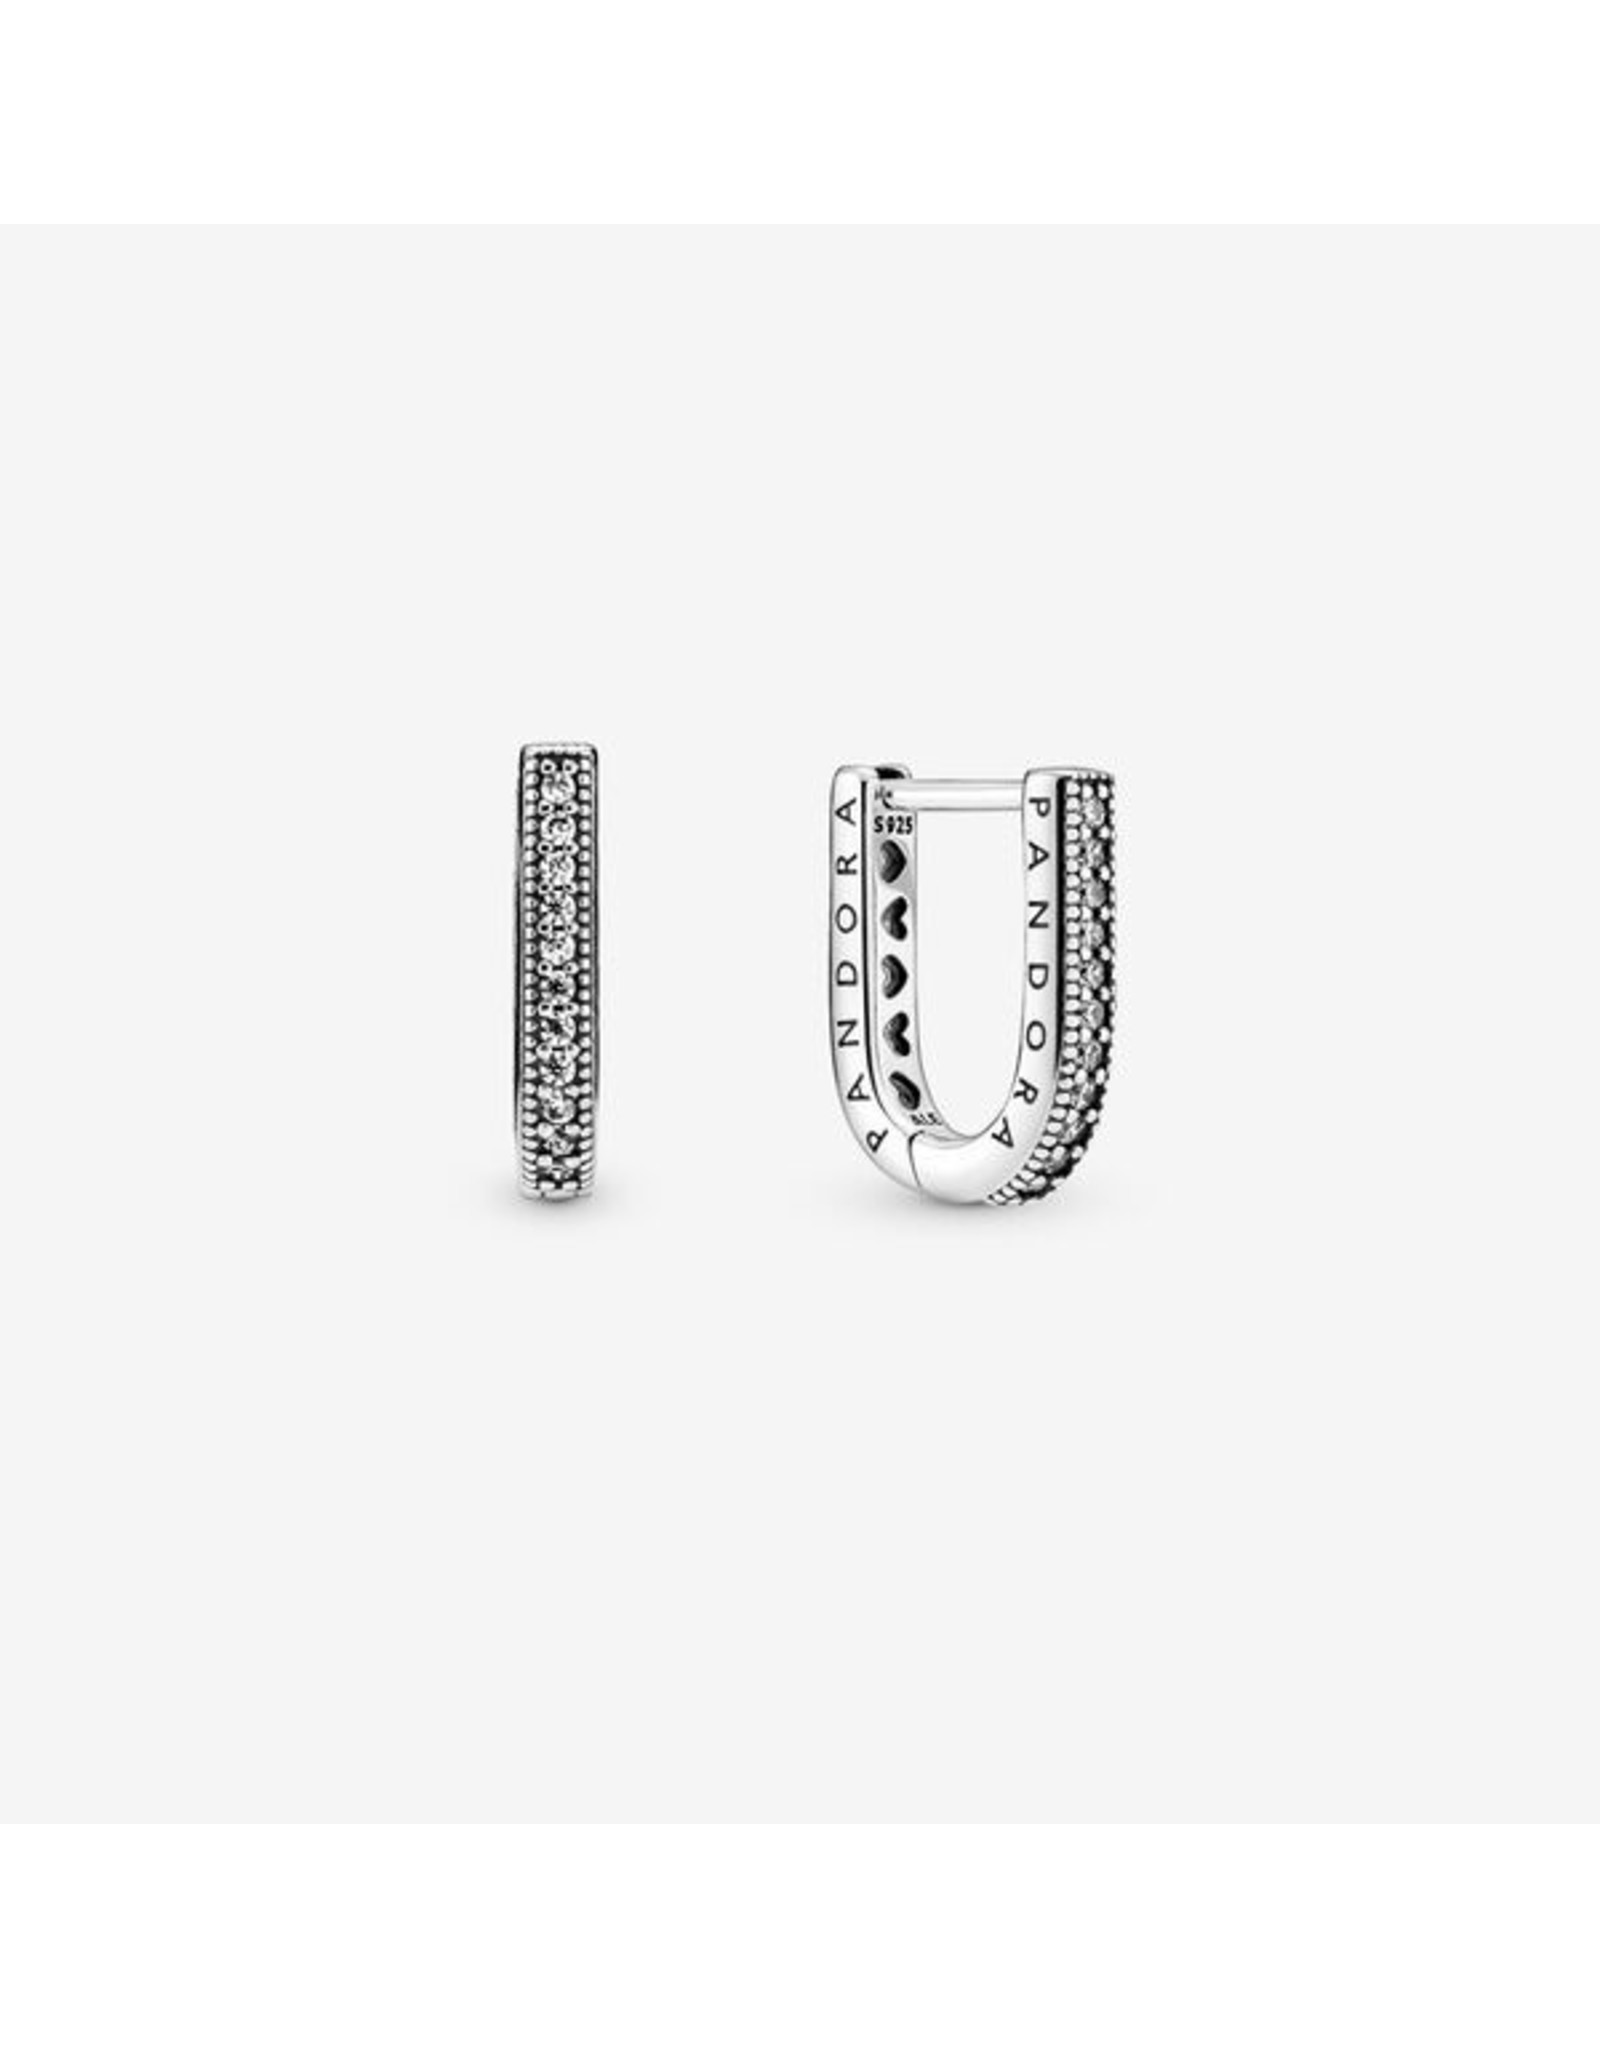 Pandora Pandora Earrings, 299488C01, U-Shaped Hoop, Clear CZ